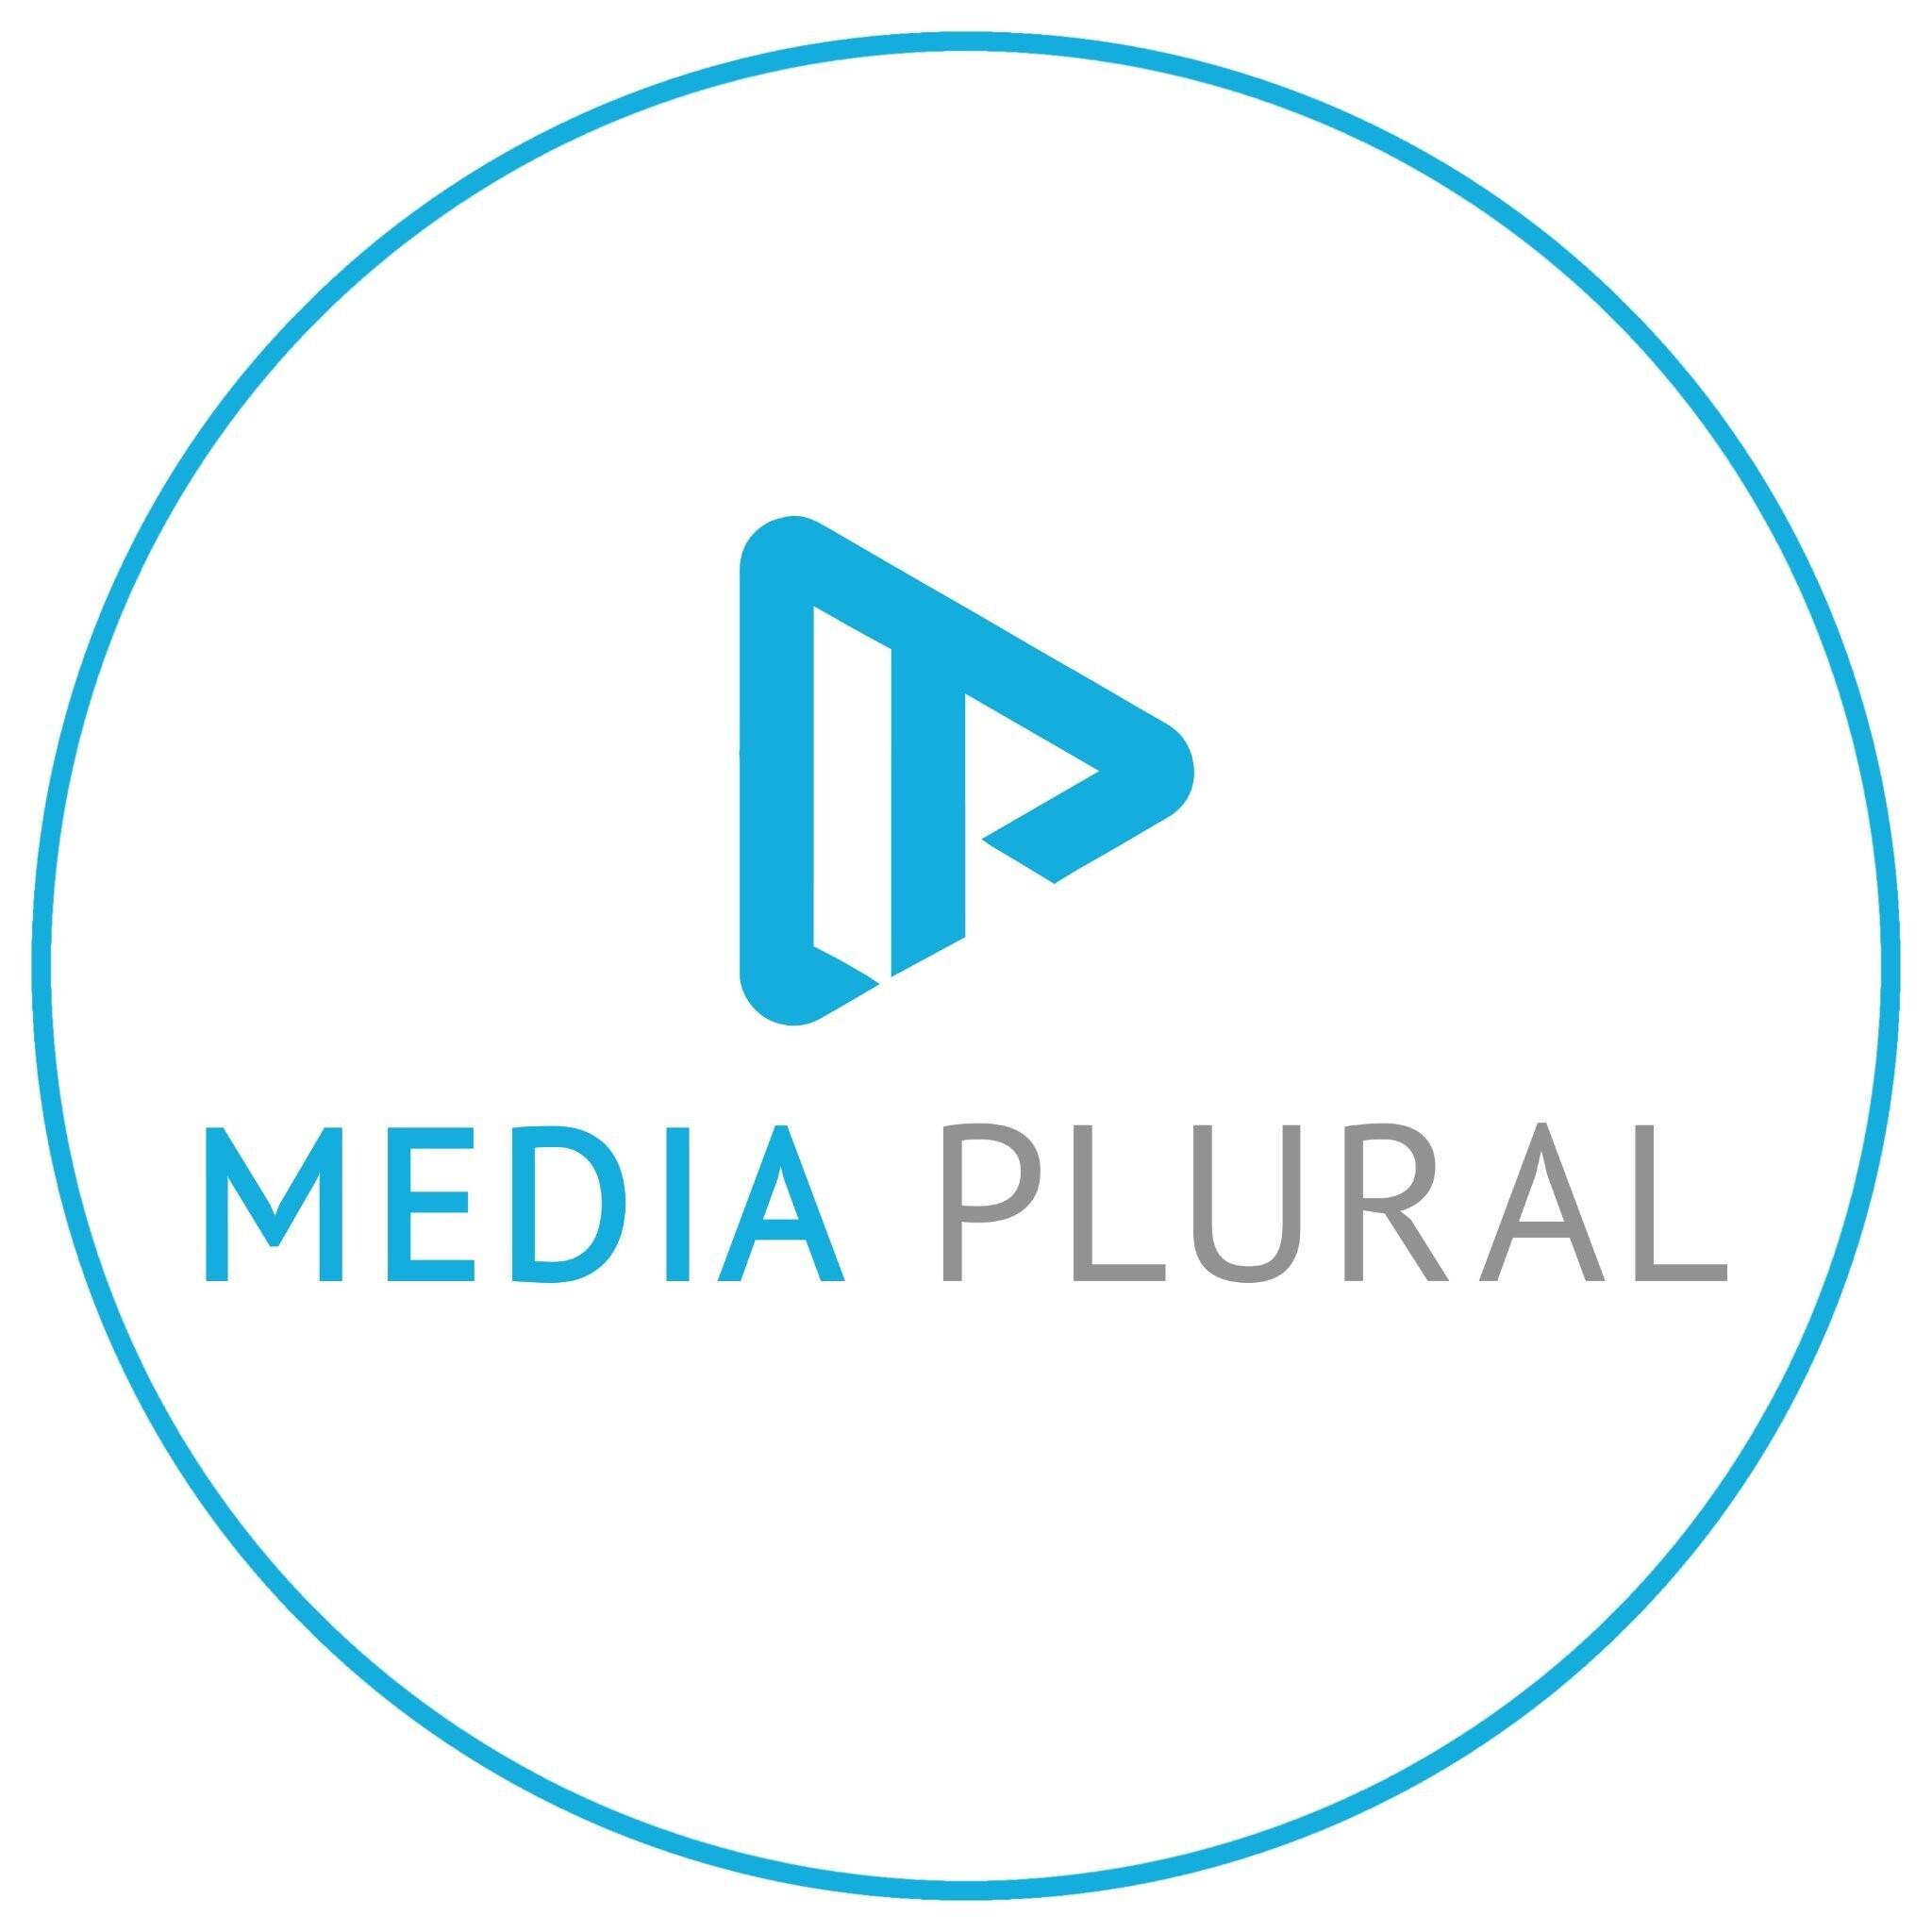 Media Plural